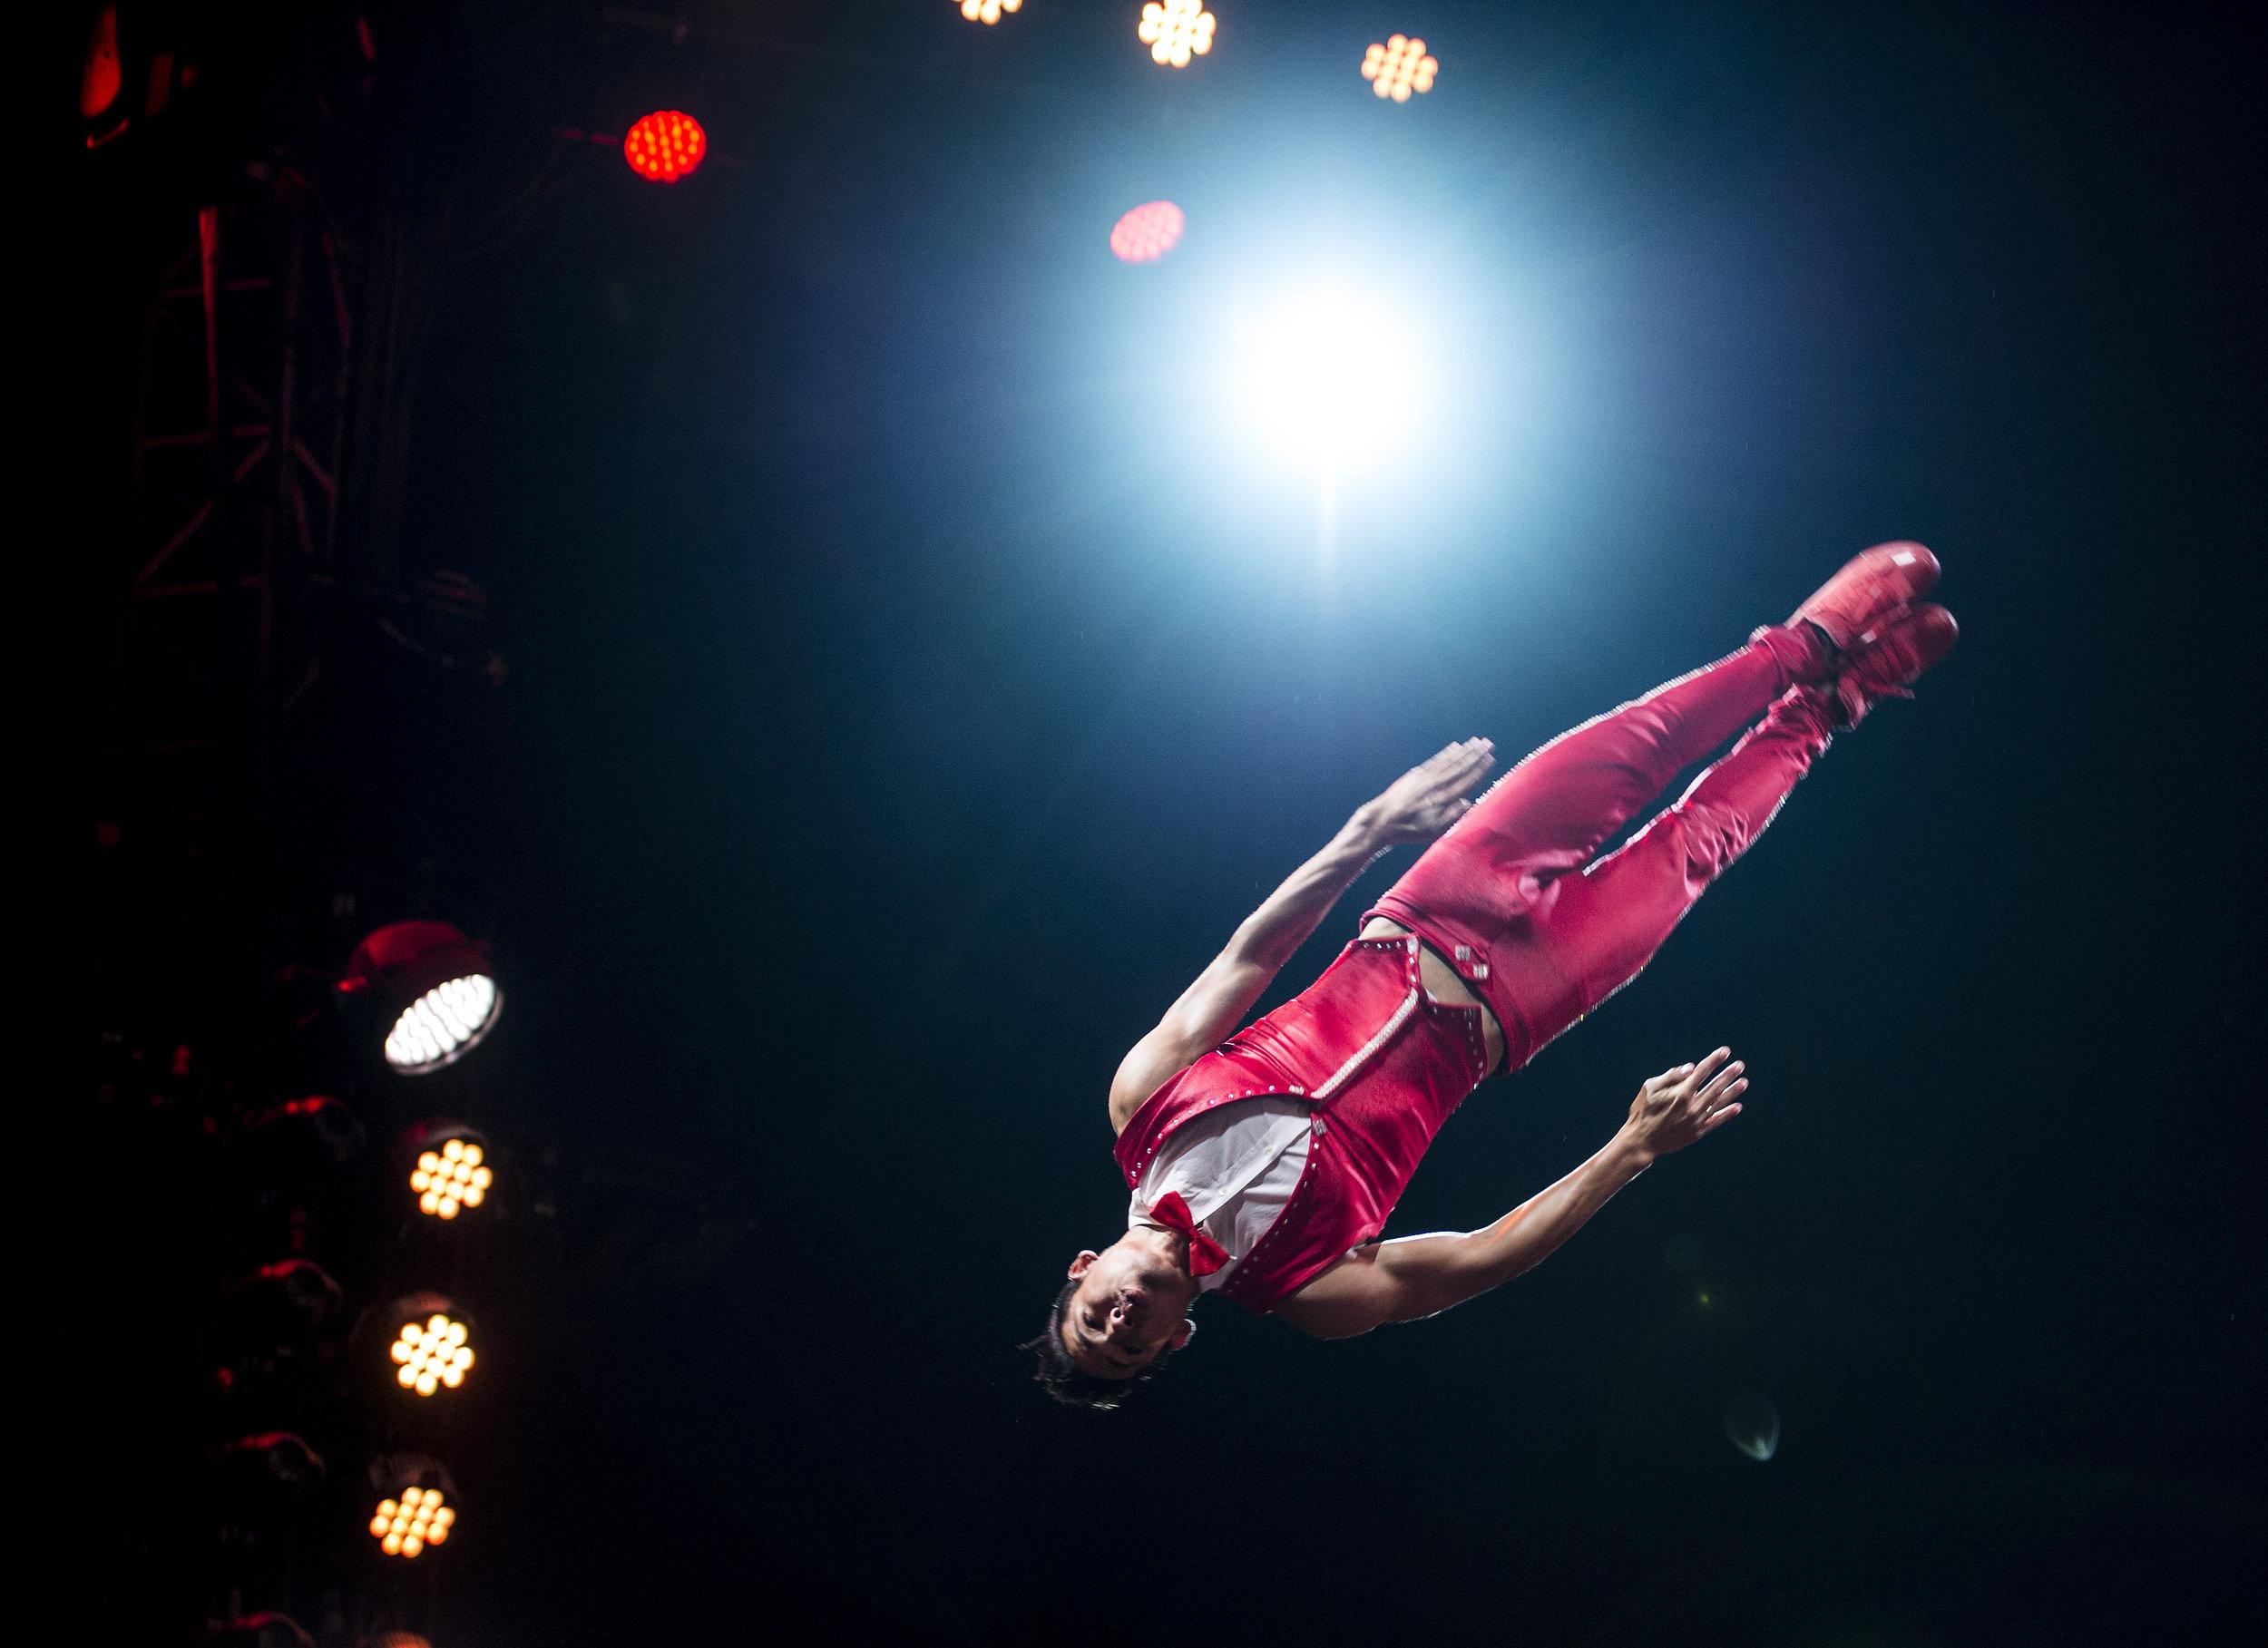 7-19-17-Circus-044.JPG